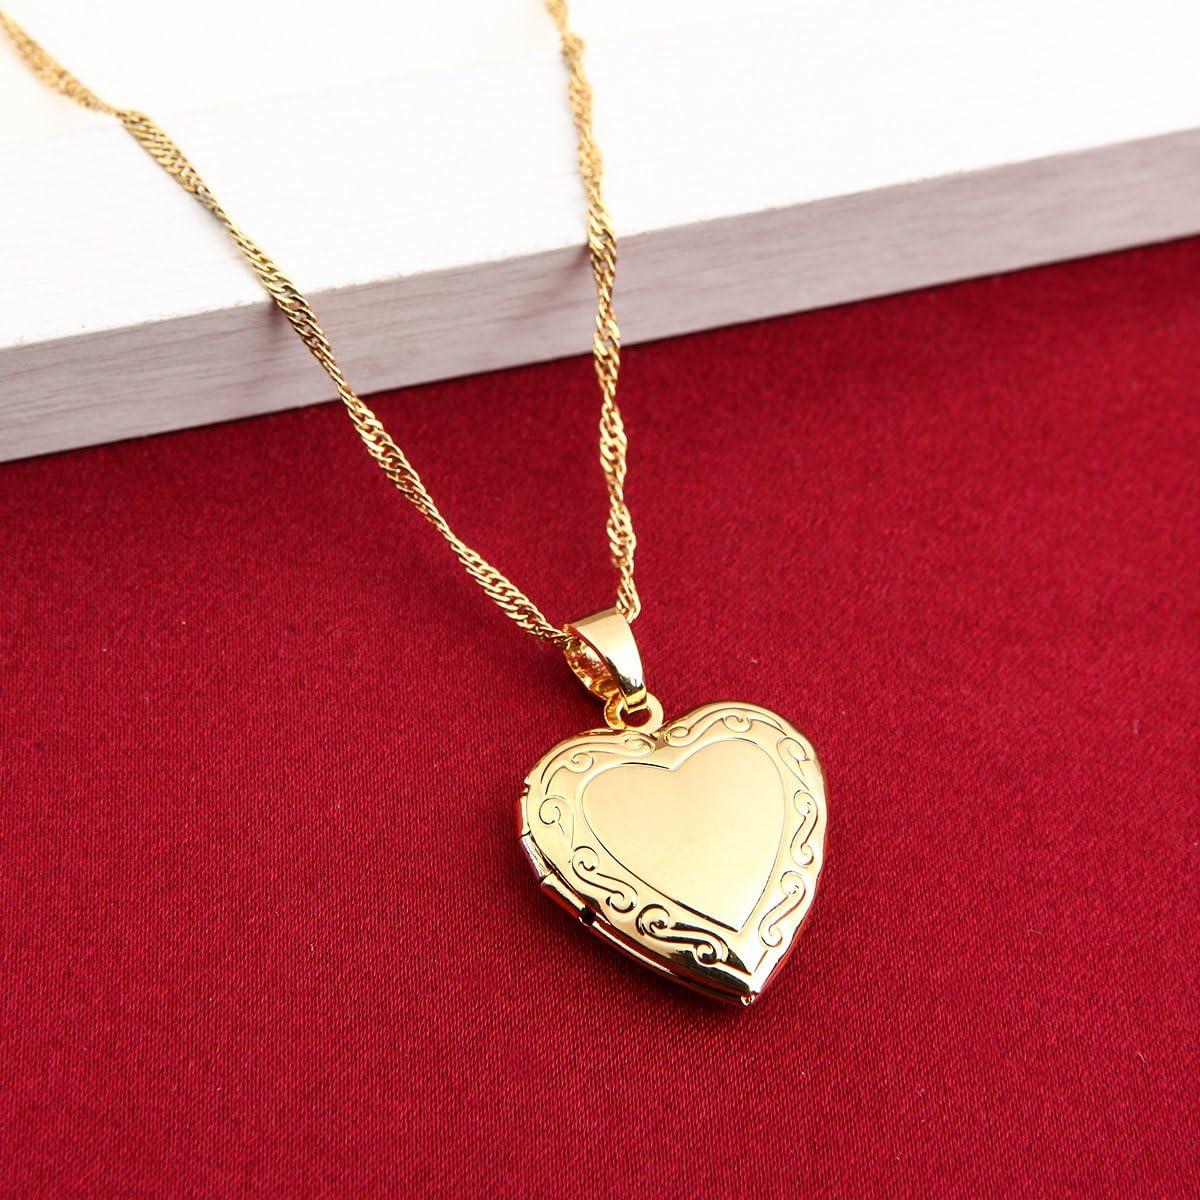 Valentines Heart Locket Pendant Necklace 24K Gold Color Romantic Fancy Heart Jewelry For Women